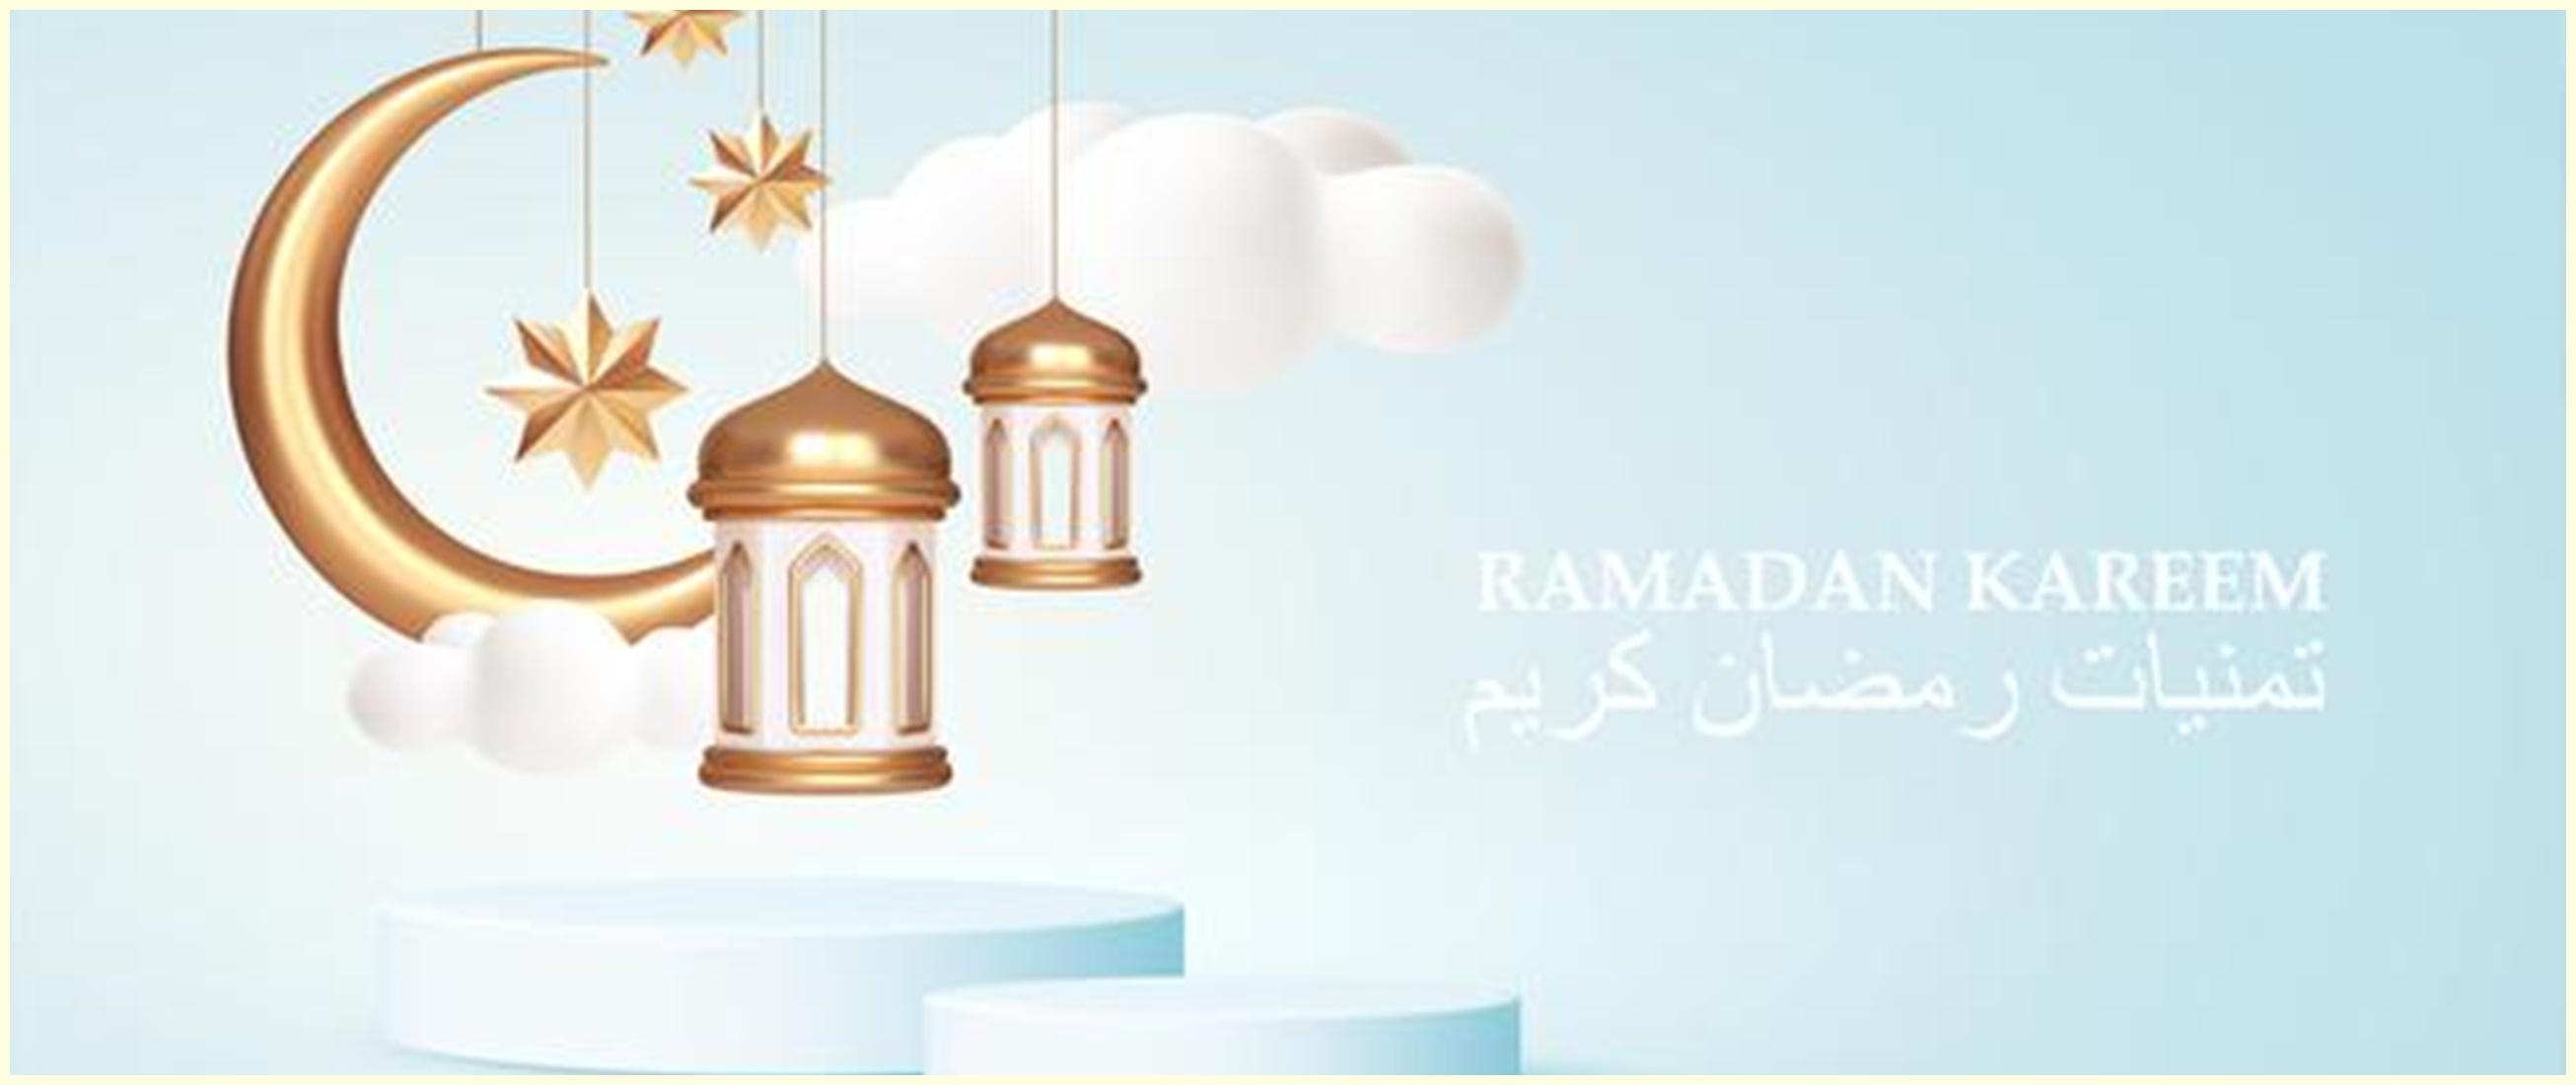 6 Hikmah puasa Ramadhan, meningkatkan kesehatan jasmani